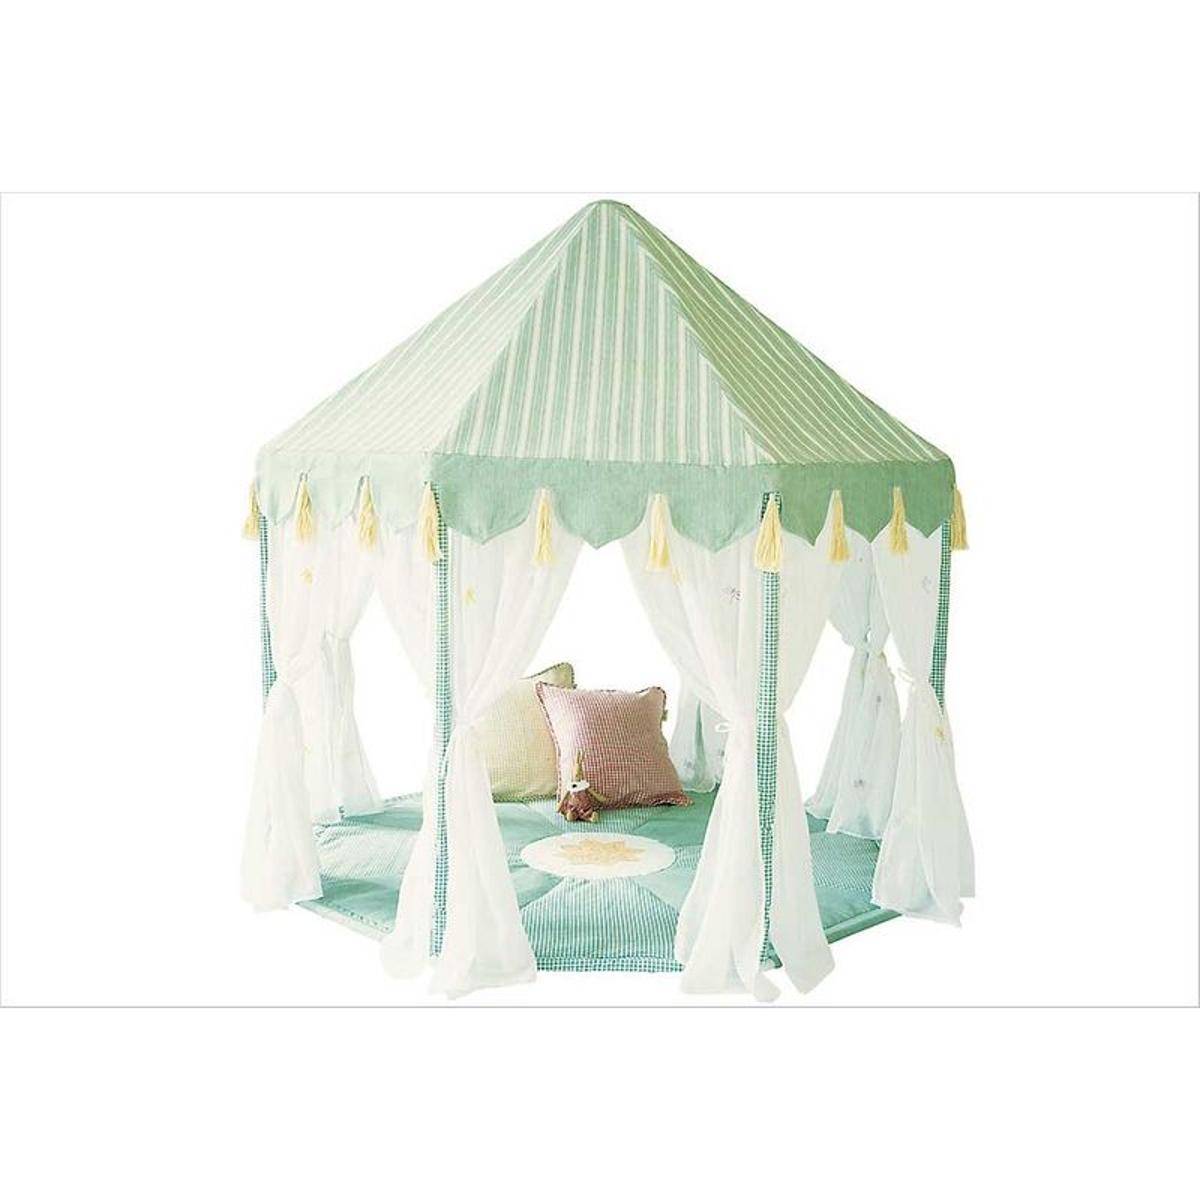 Tente pavillon verte Win Green